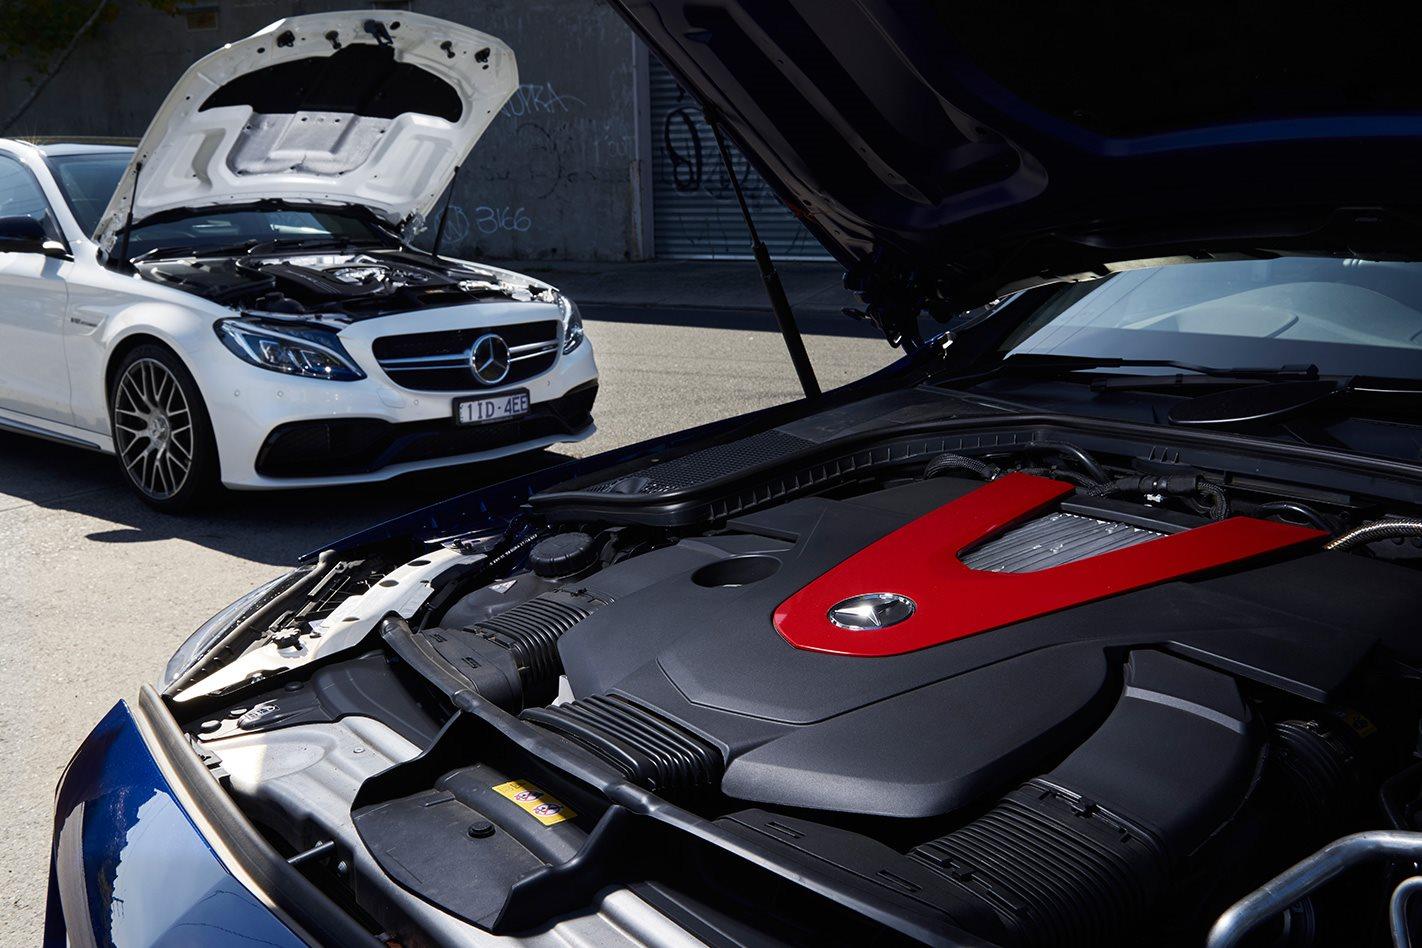 Mercedes AMG C43 Mercedes AMG C63 engine